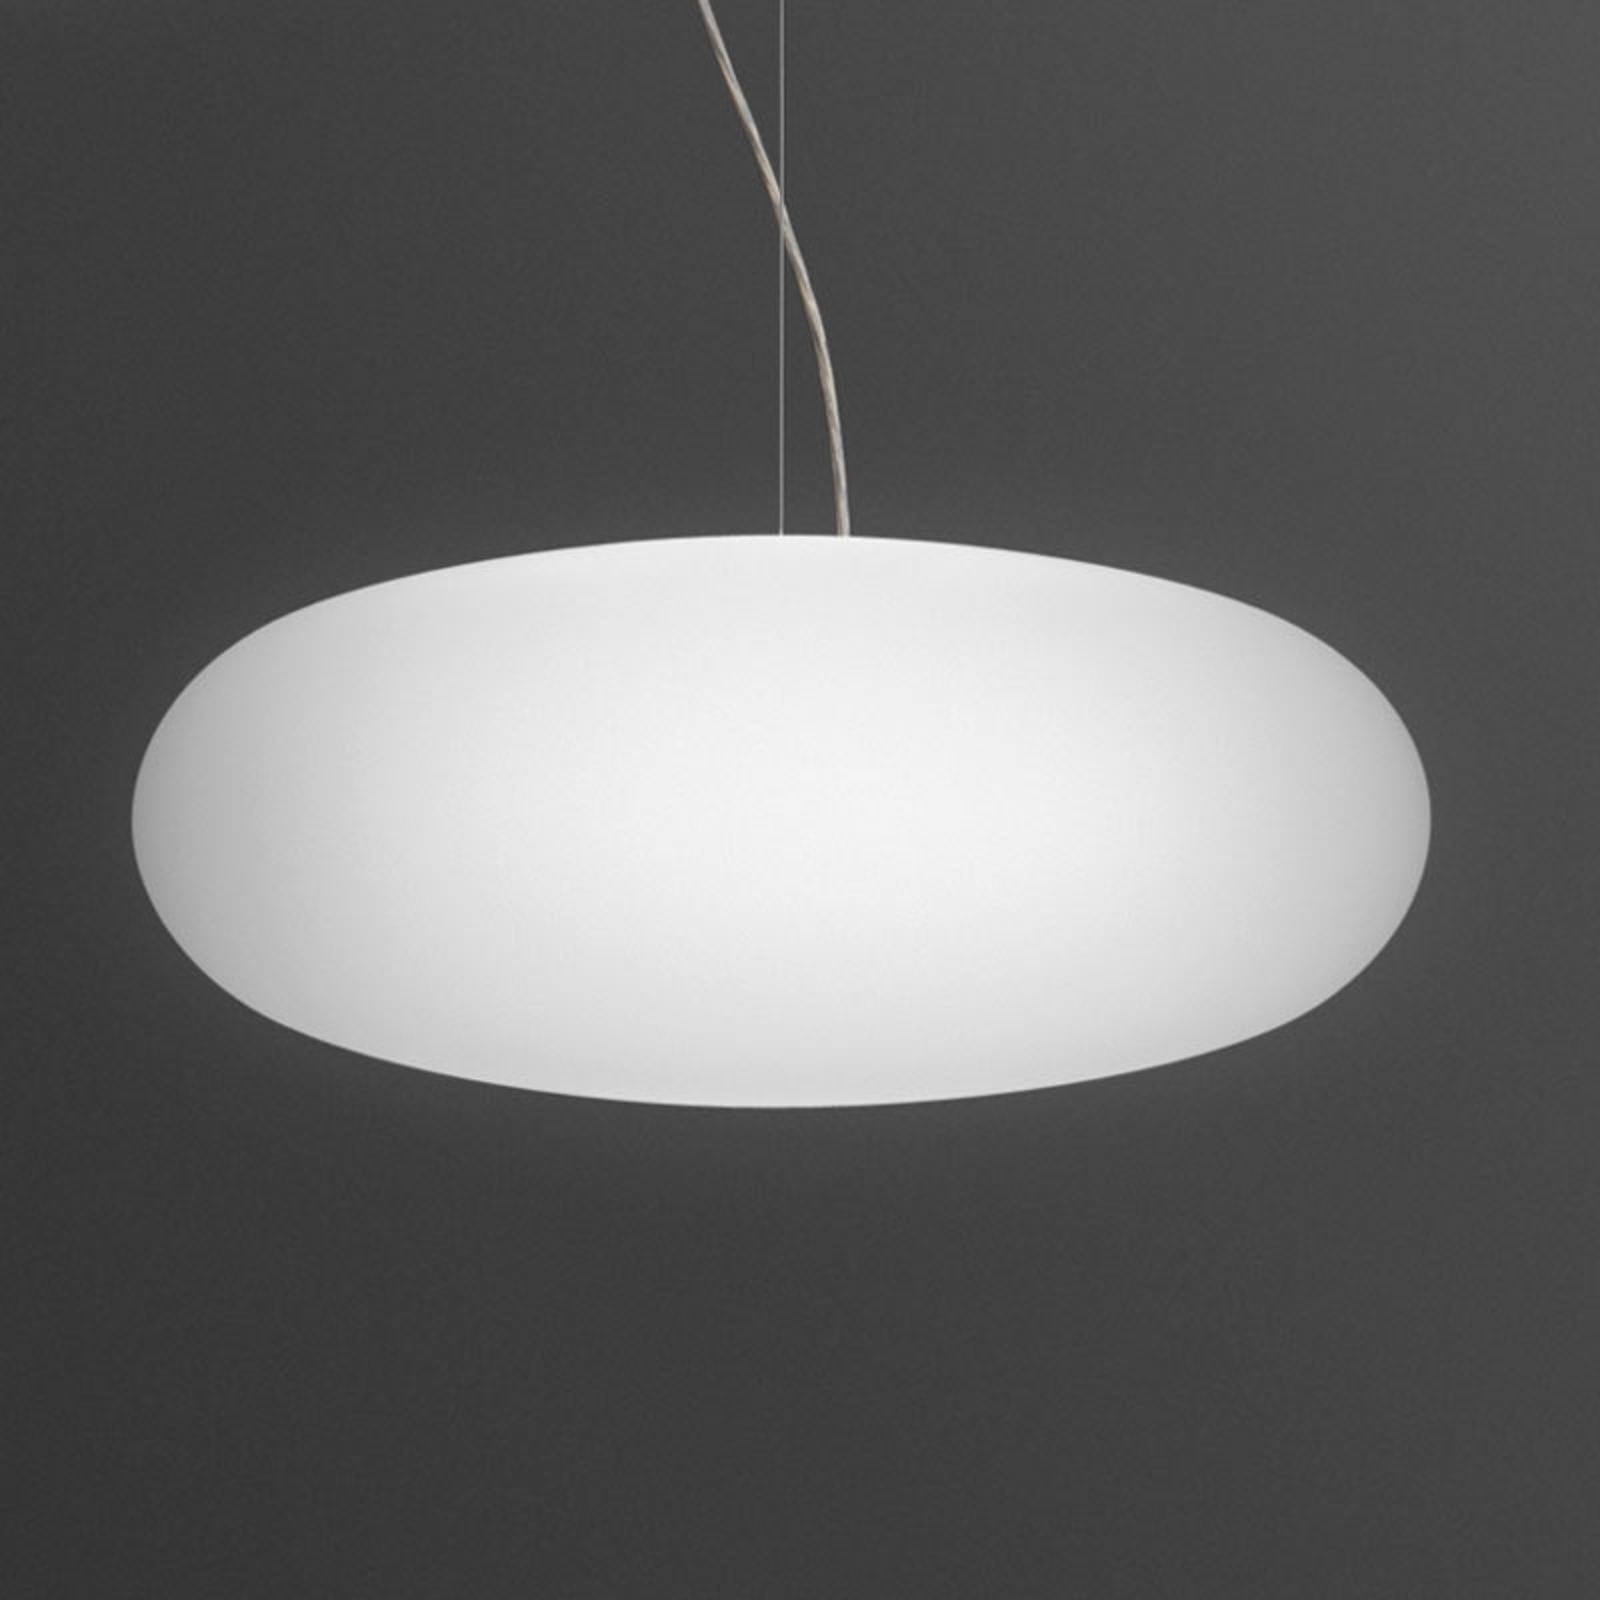 Vibia Vol 0225 lampa wisząca ze szkła, Ø 60 cm